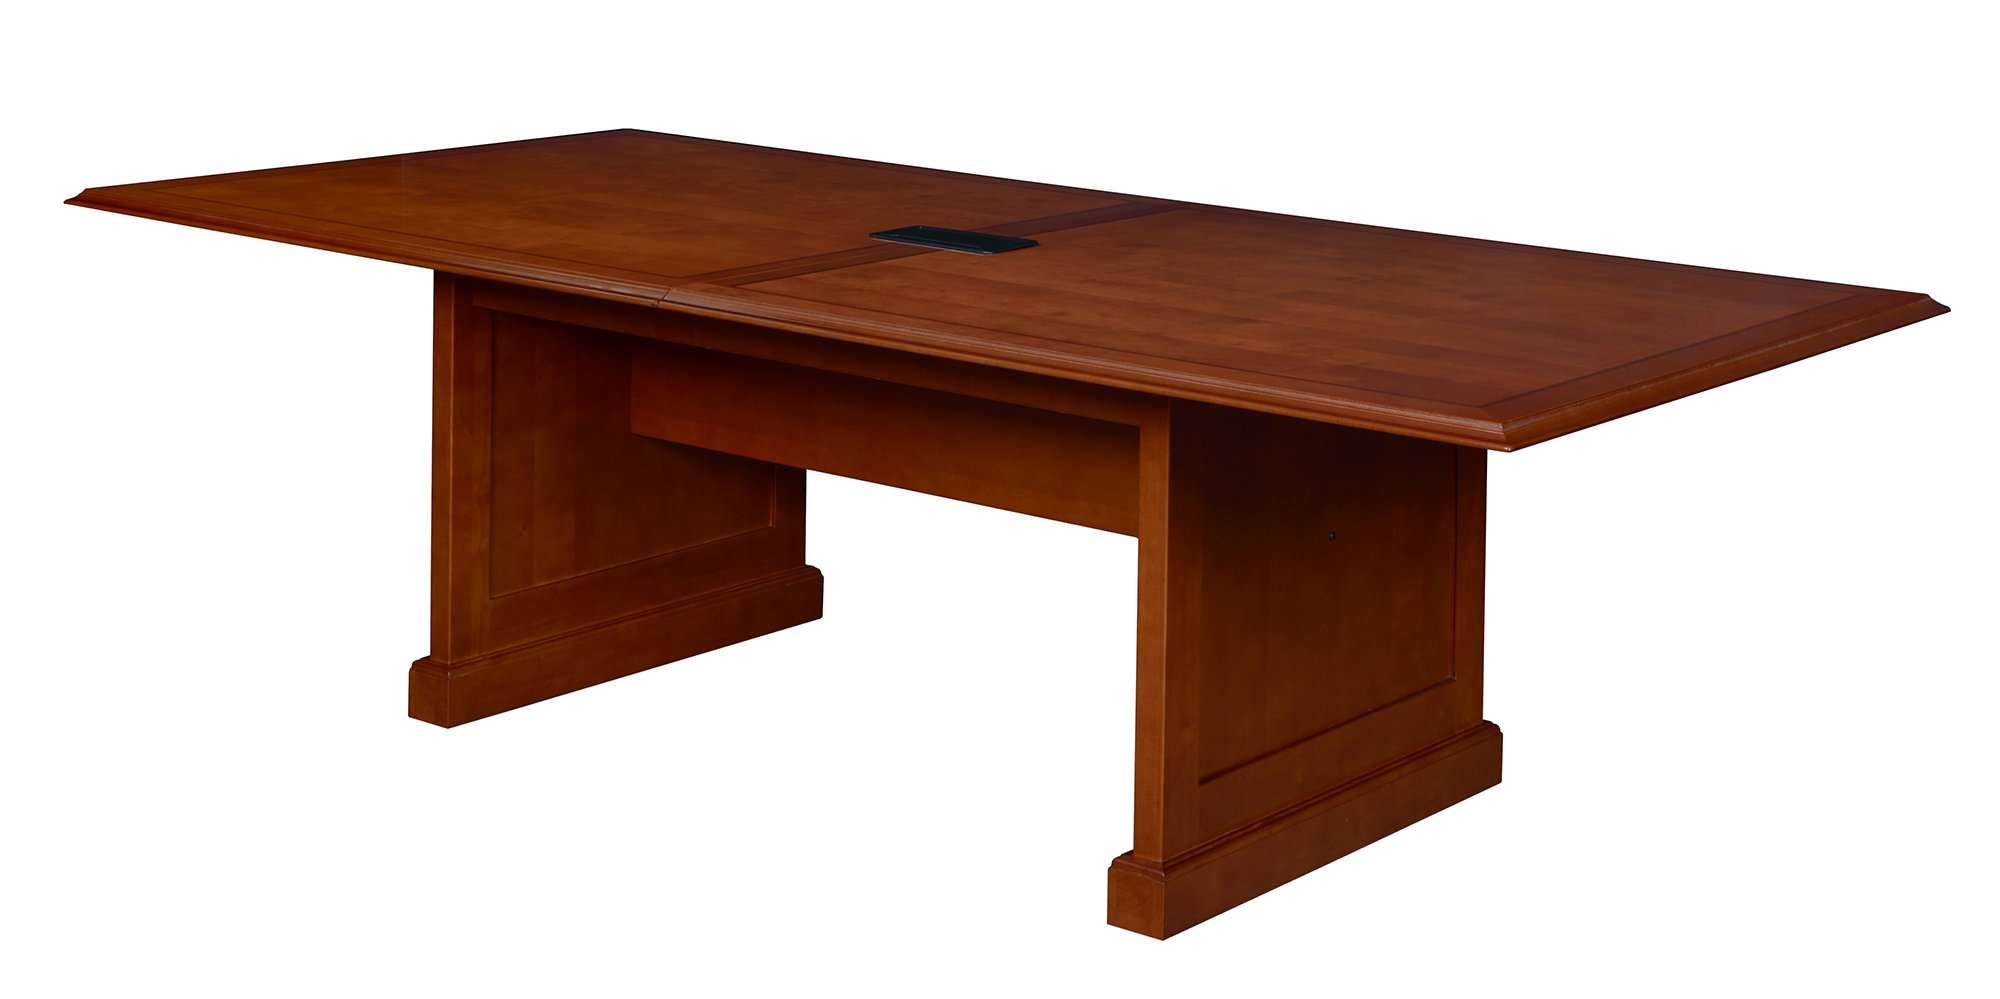 Regency TVCTRC12048CH Prestige Traditional Veneer Rectangular Conference Table, 120-inch, Cherry